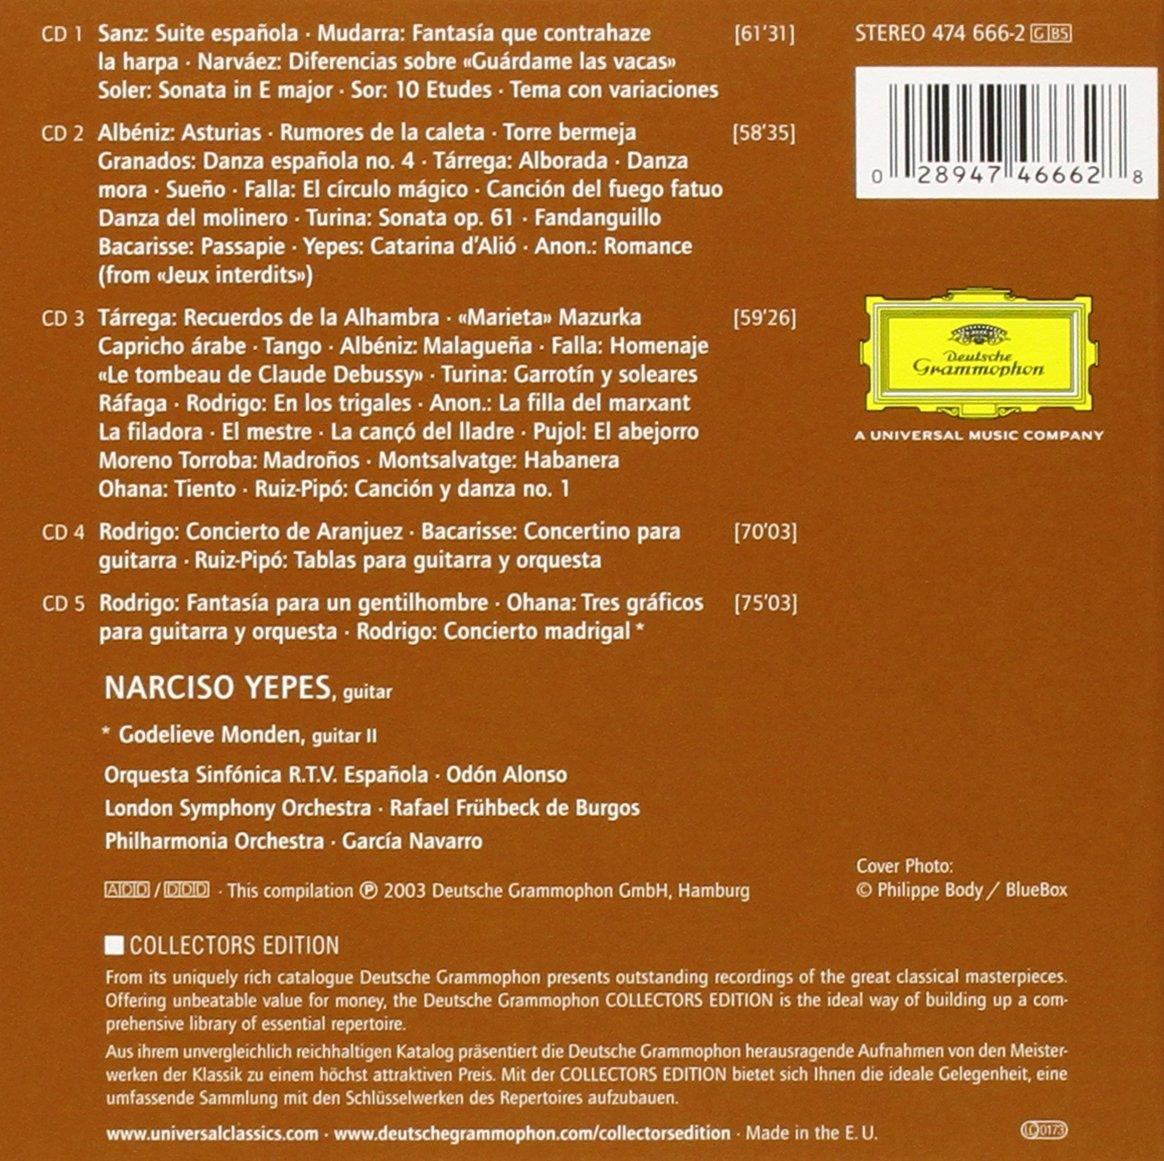 Guitarra Espanola: Narciso Yepes: Amazon.es: Música